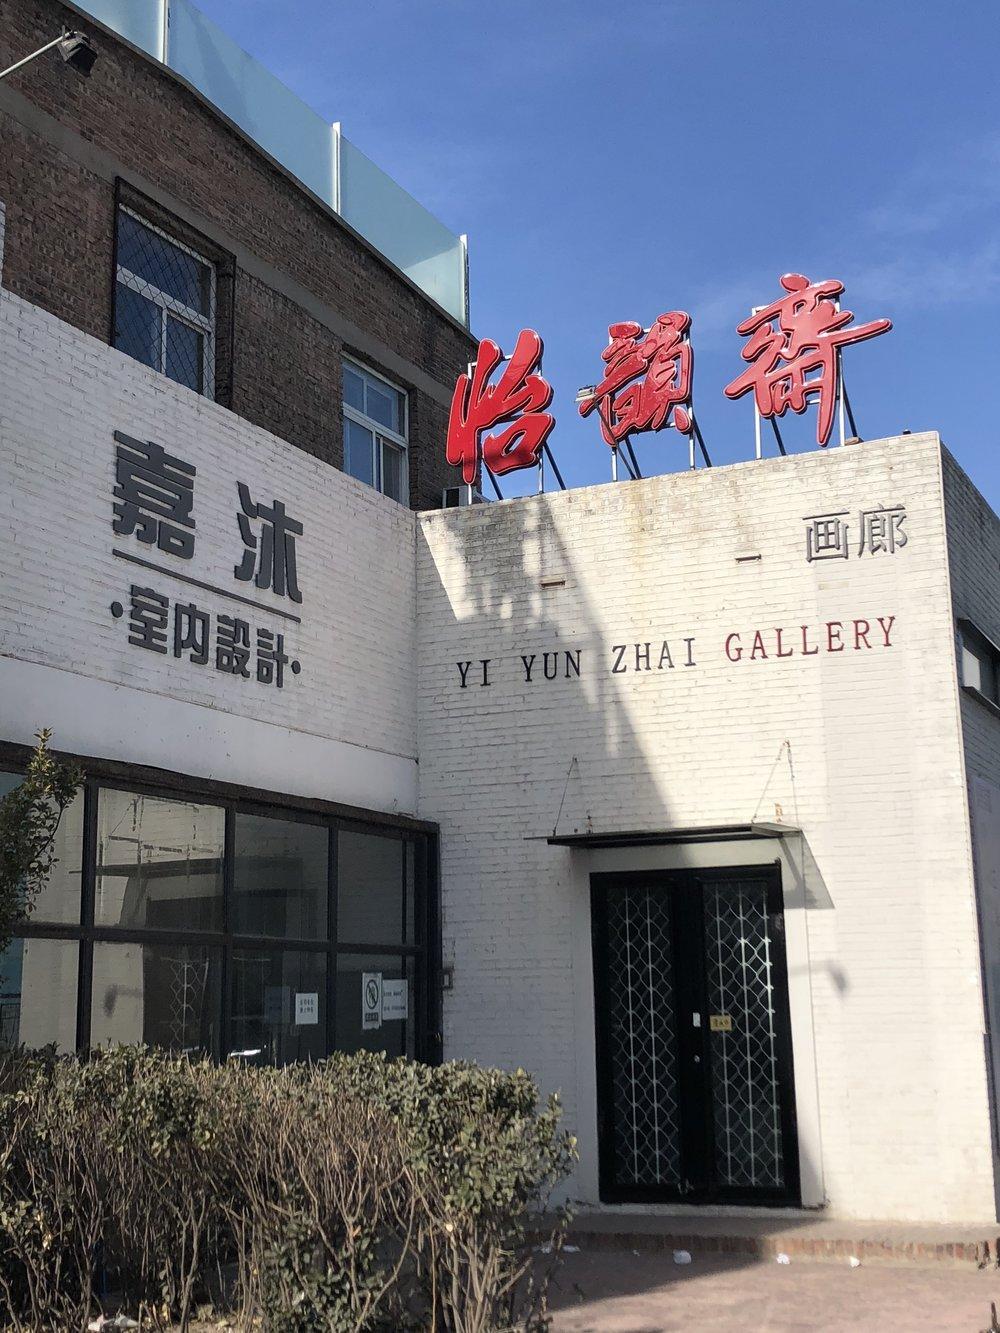 789 art district